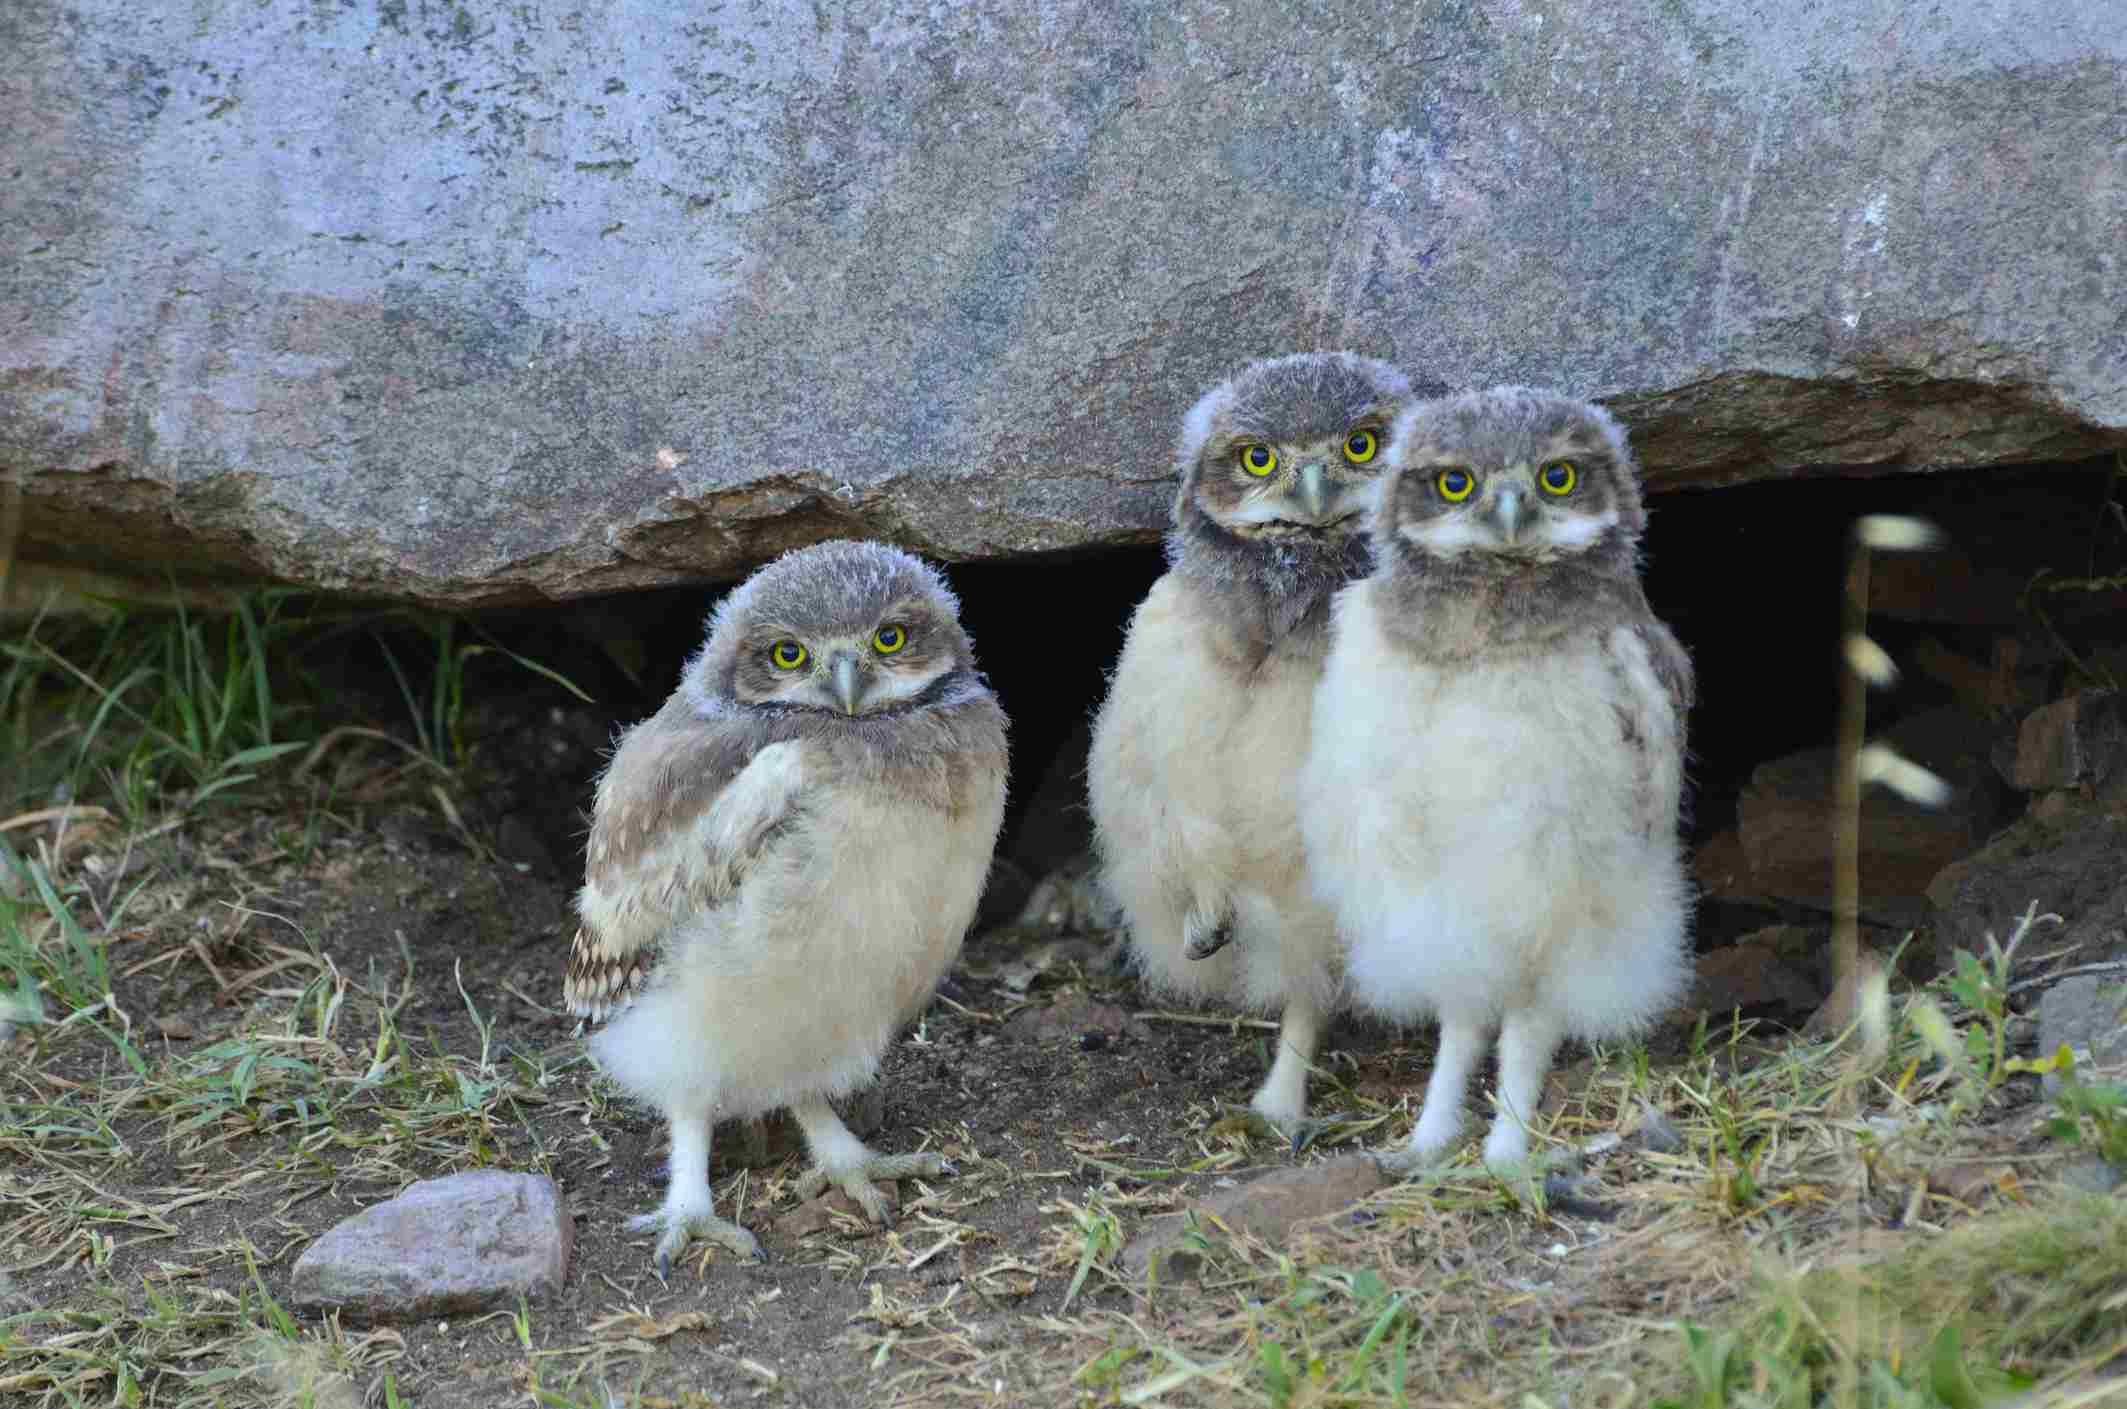 Trio of baby owls